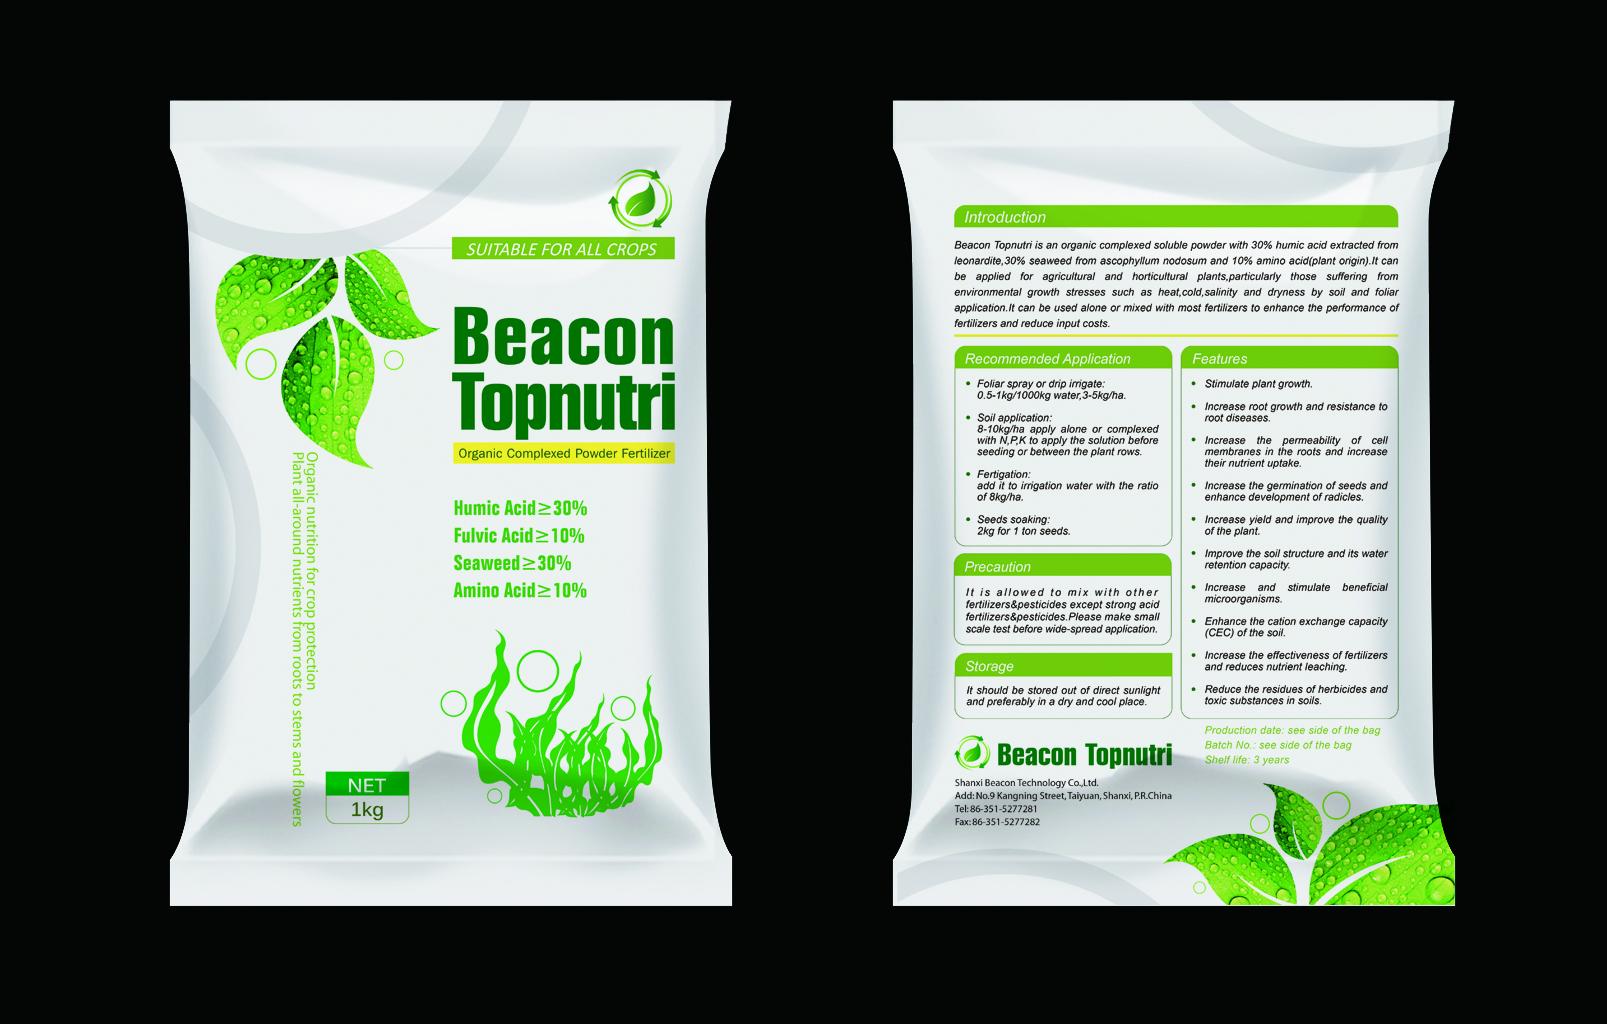 Topnutri Humic Acid+Seaweed+Amino Acid Powder Fertilizer